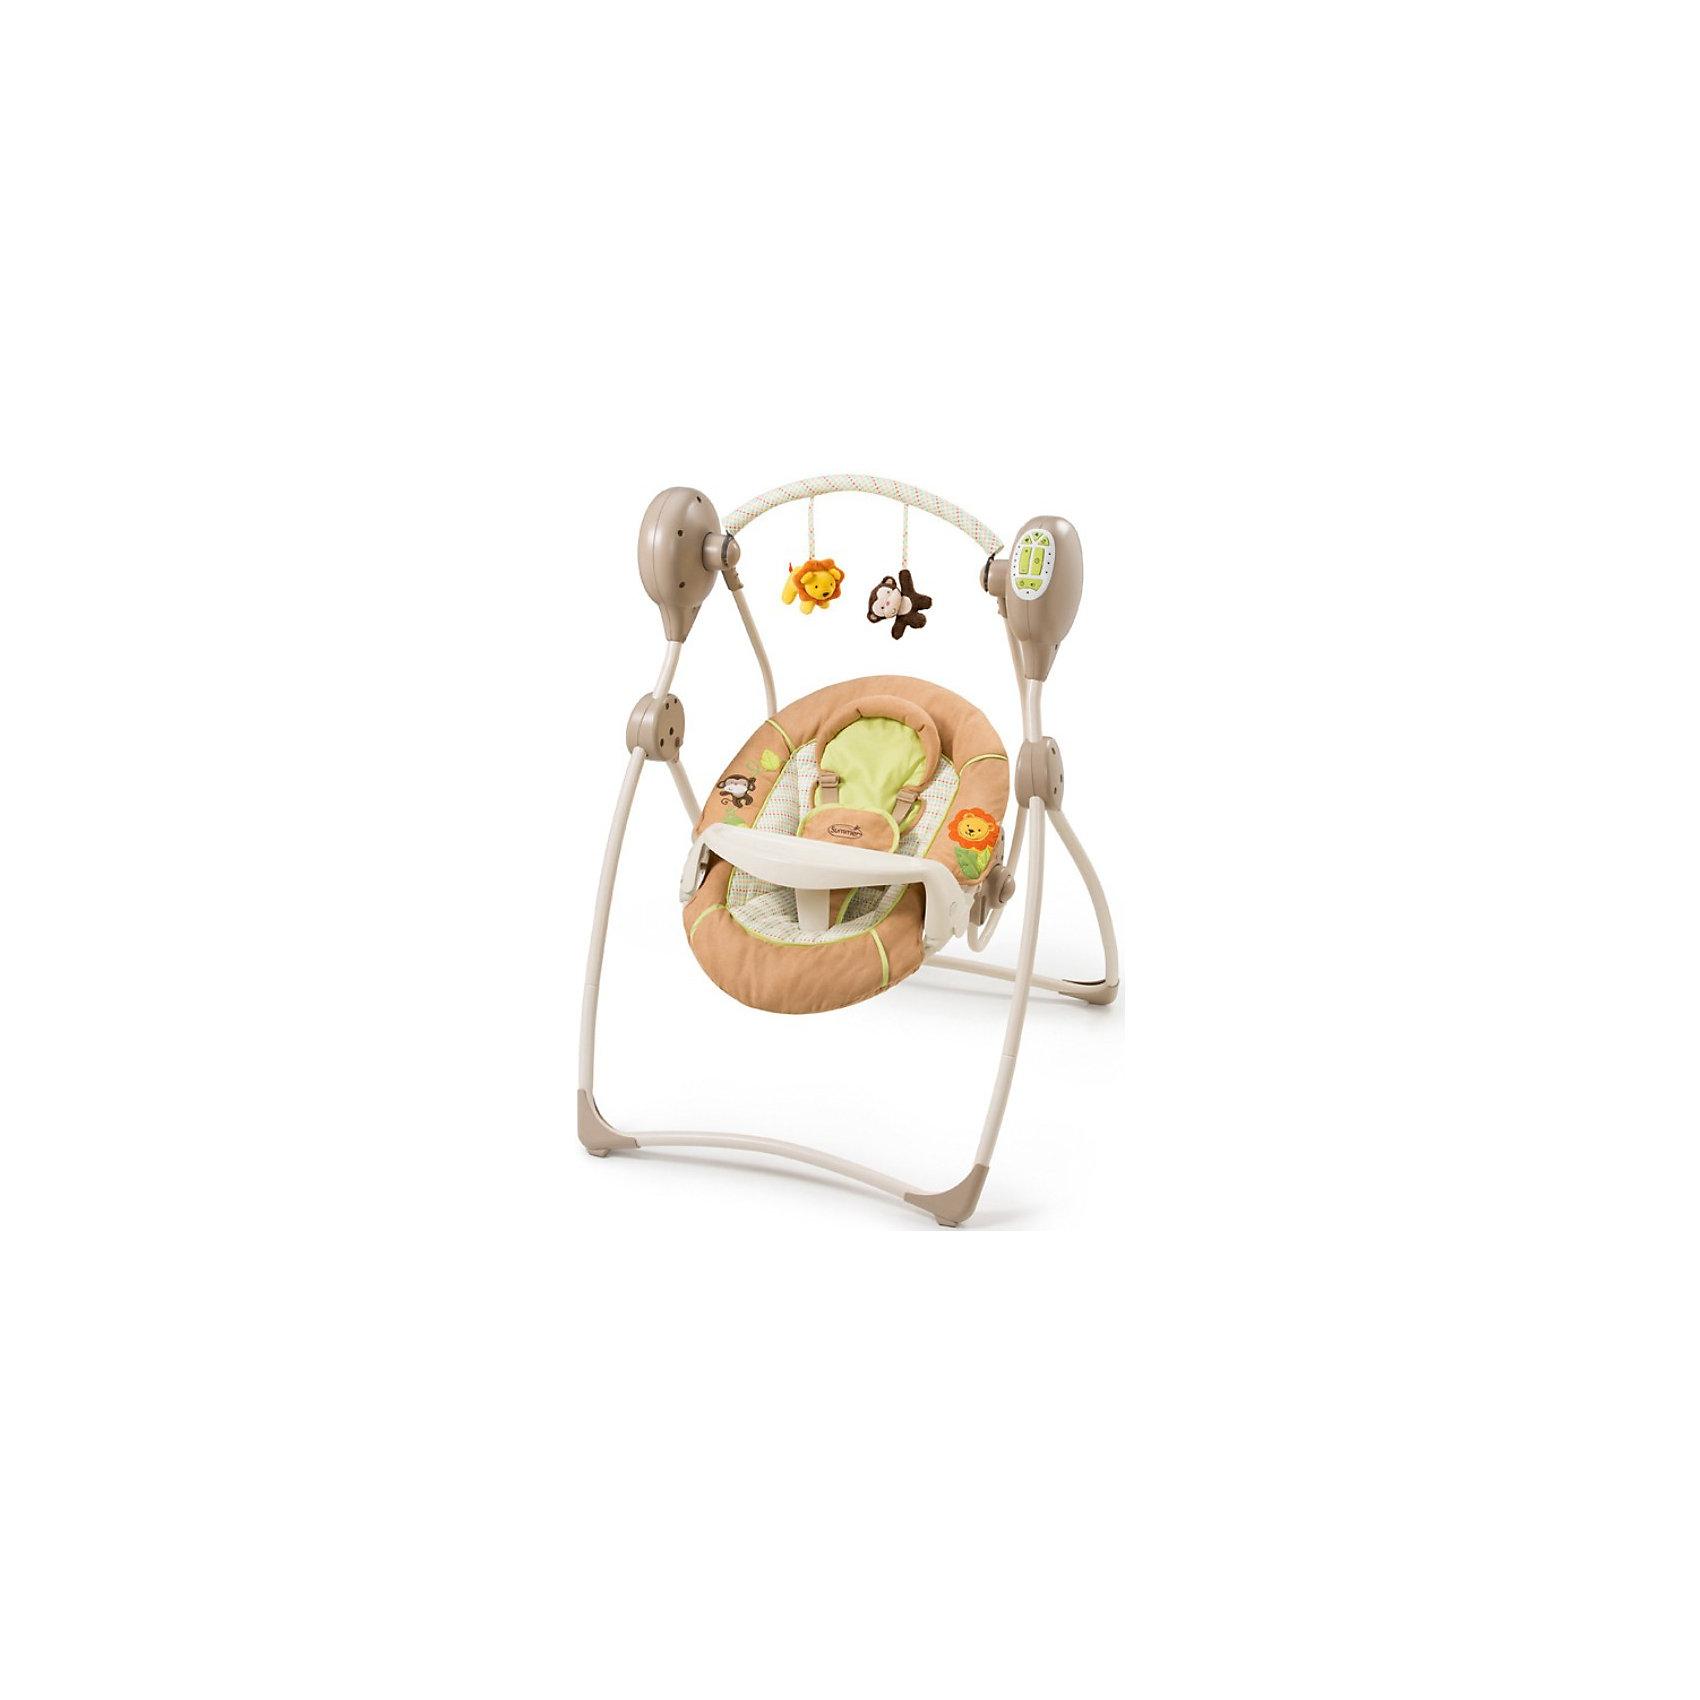 Электрокачели Swinging Safari, Summer Infant